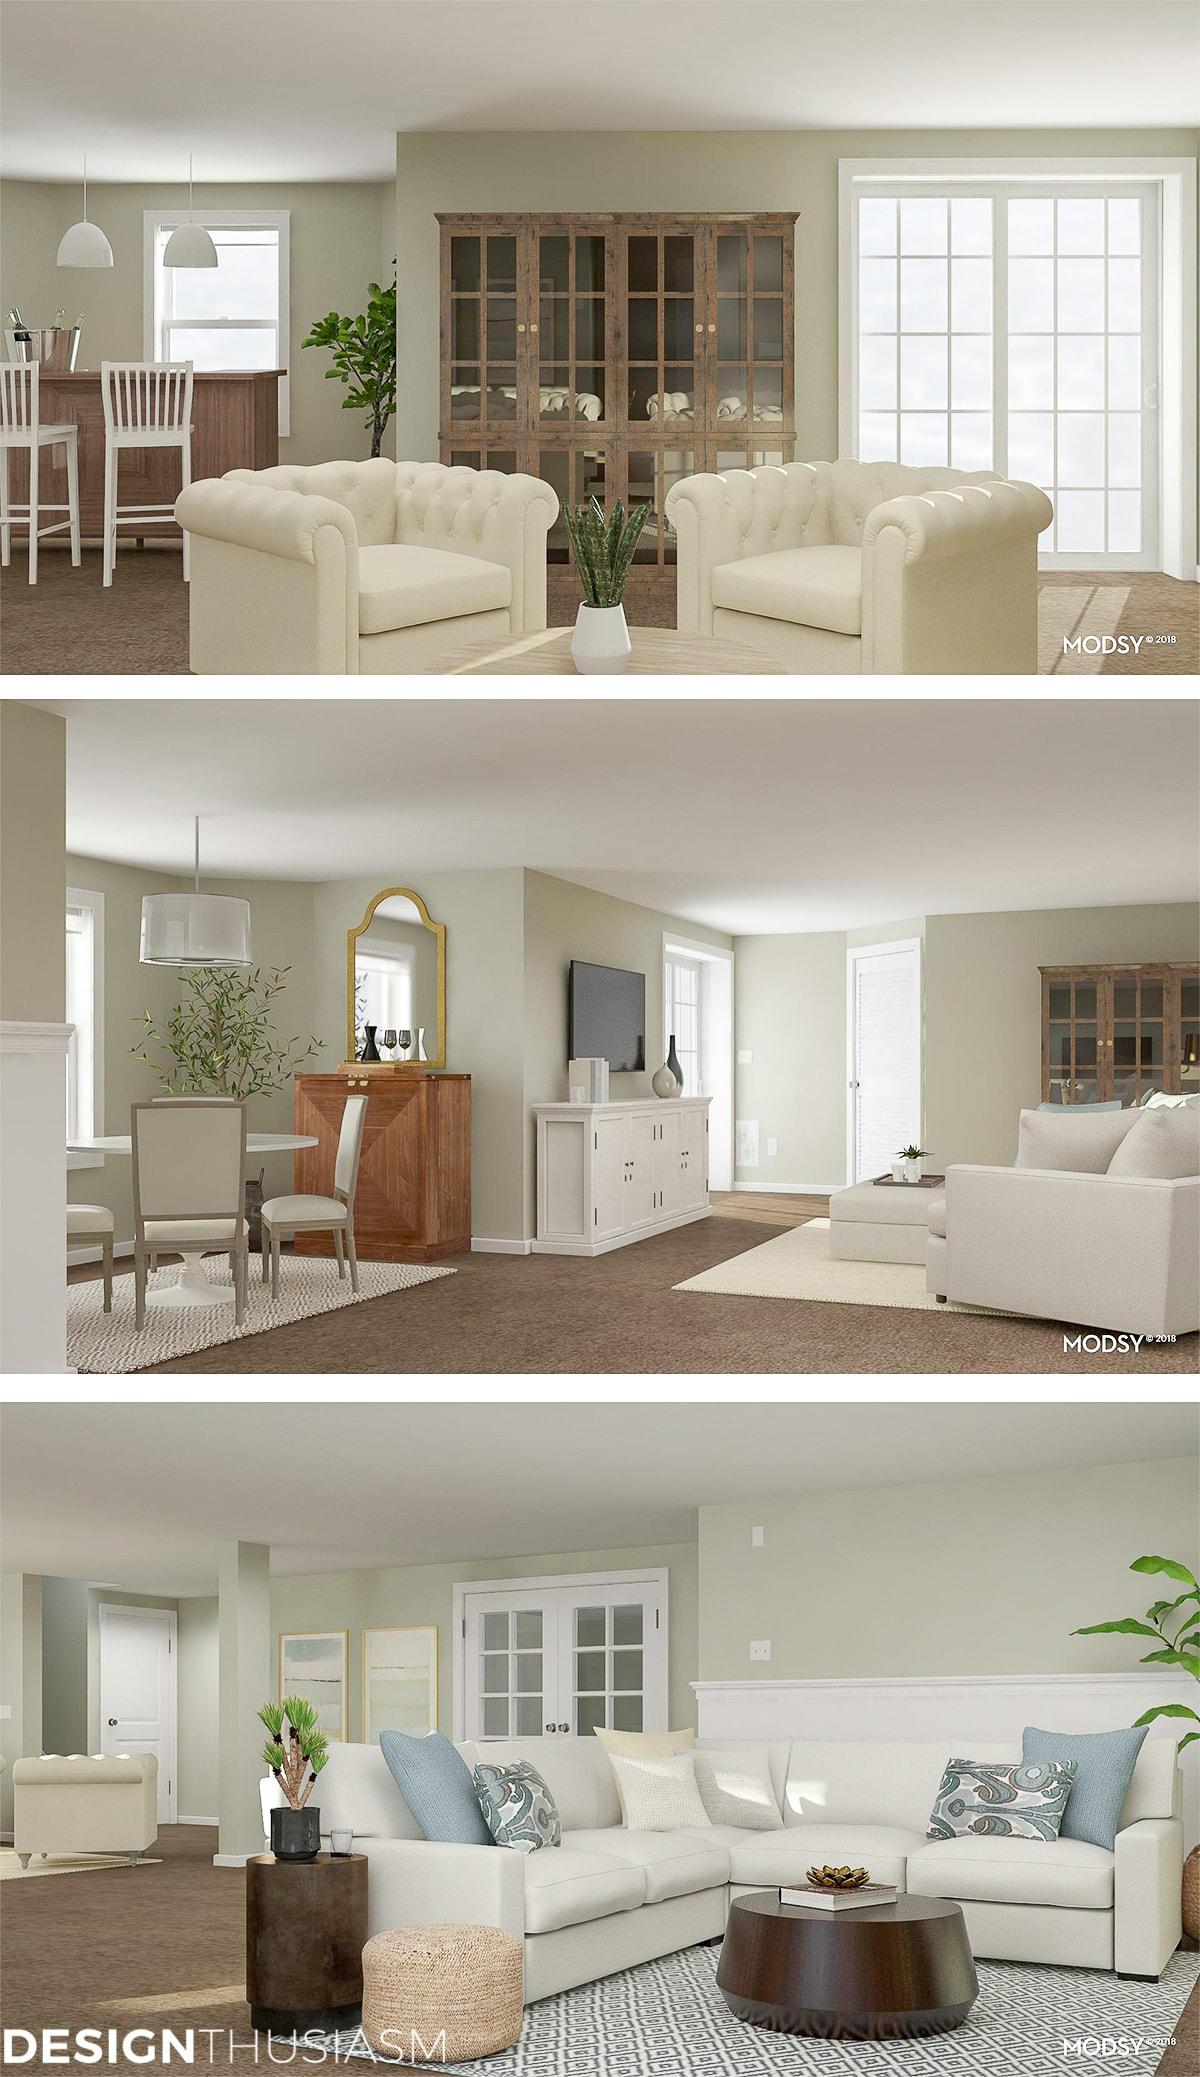 Designthusiasm- Home Style Saturday